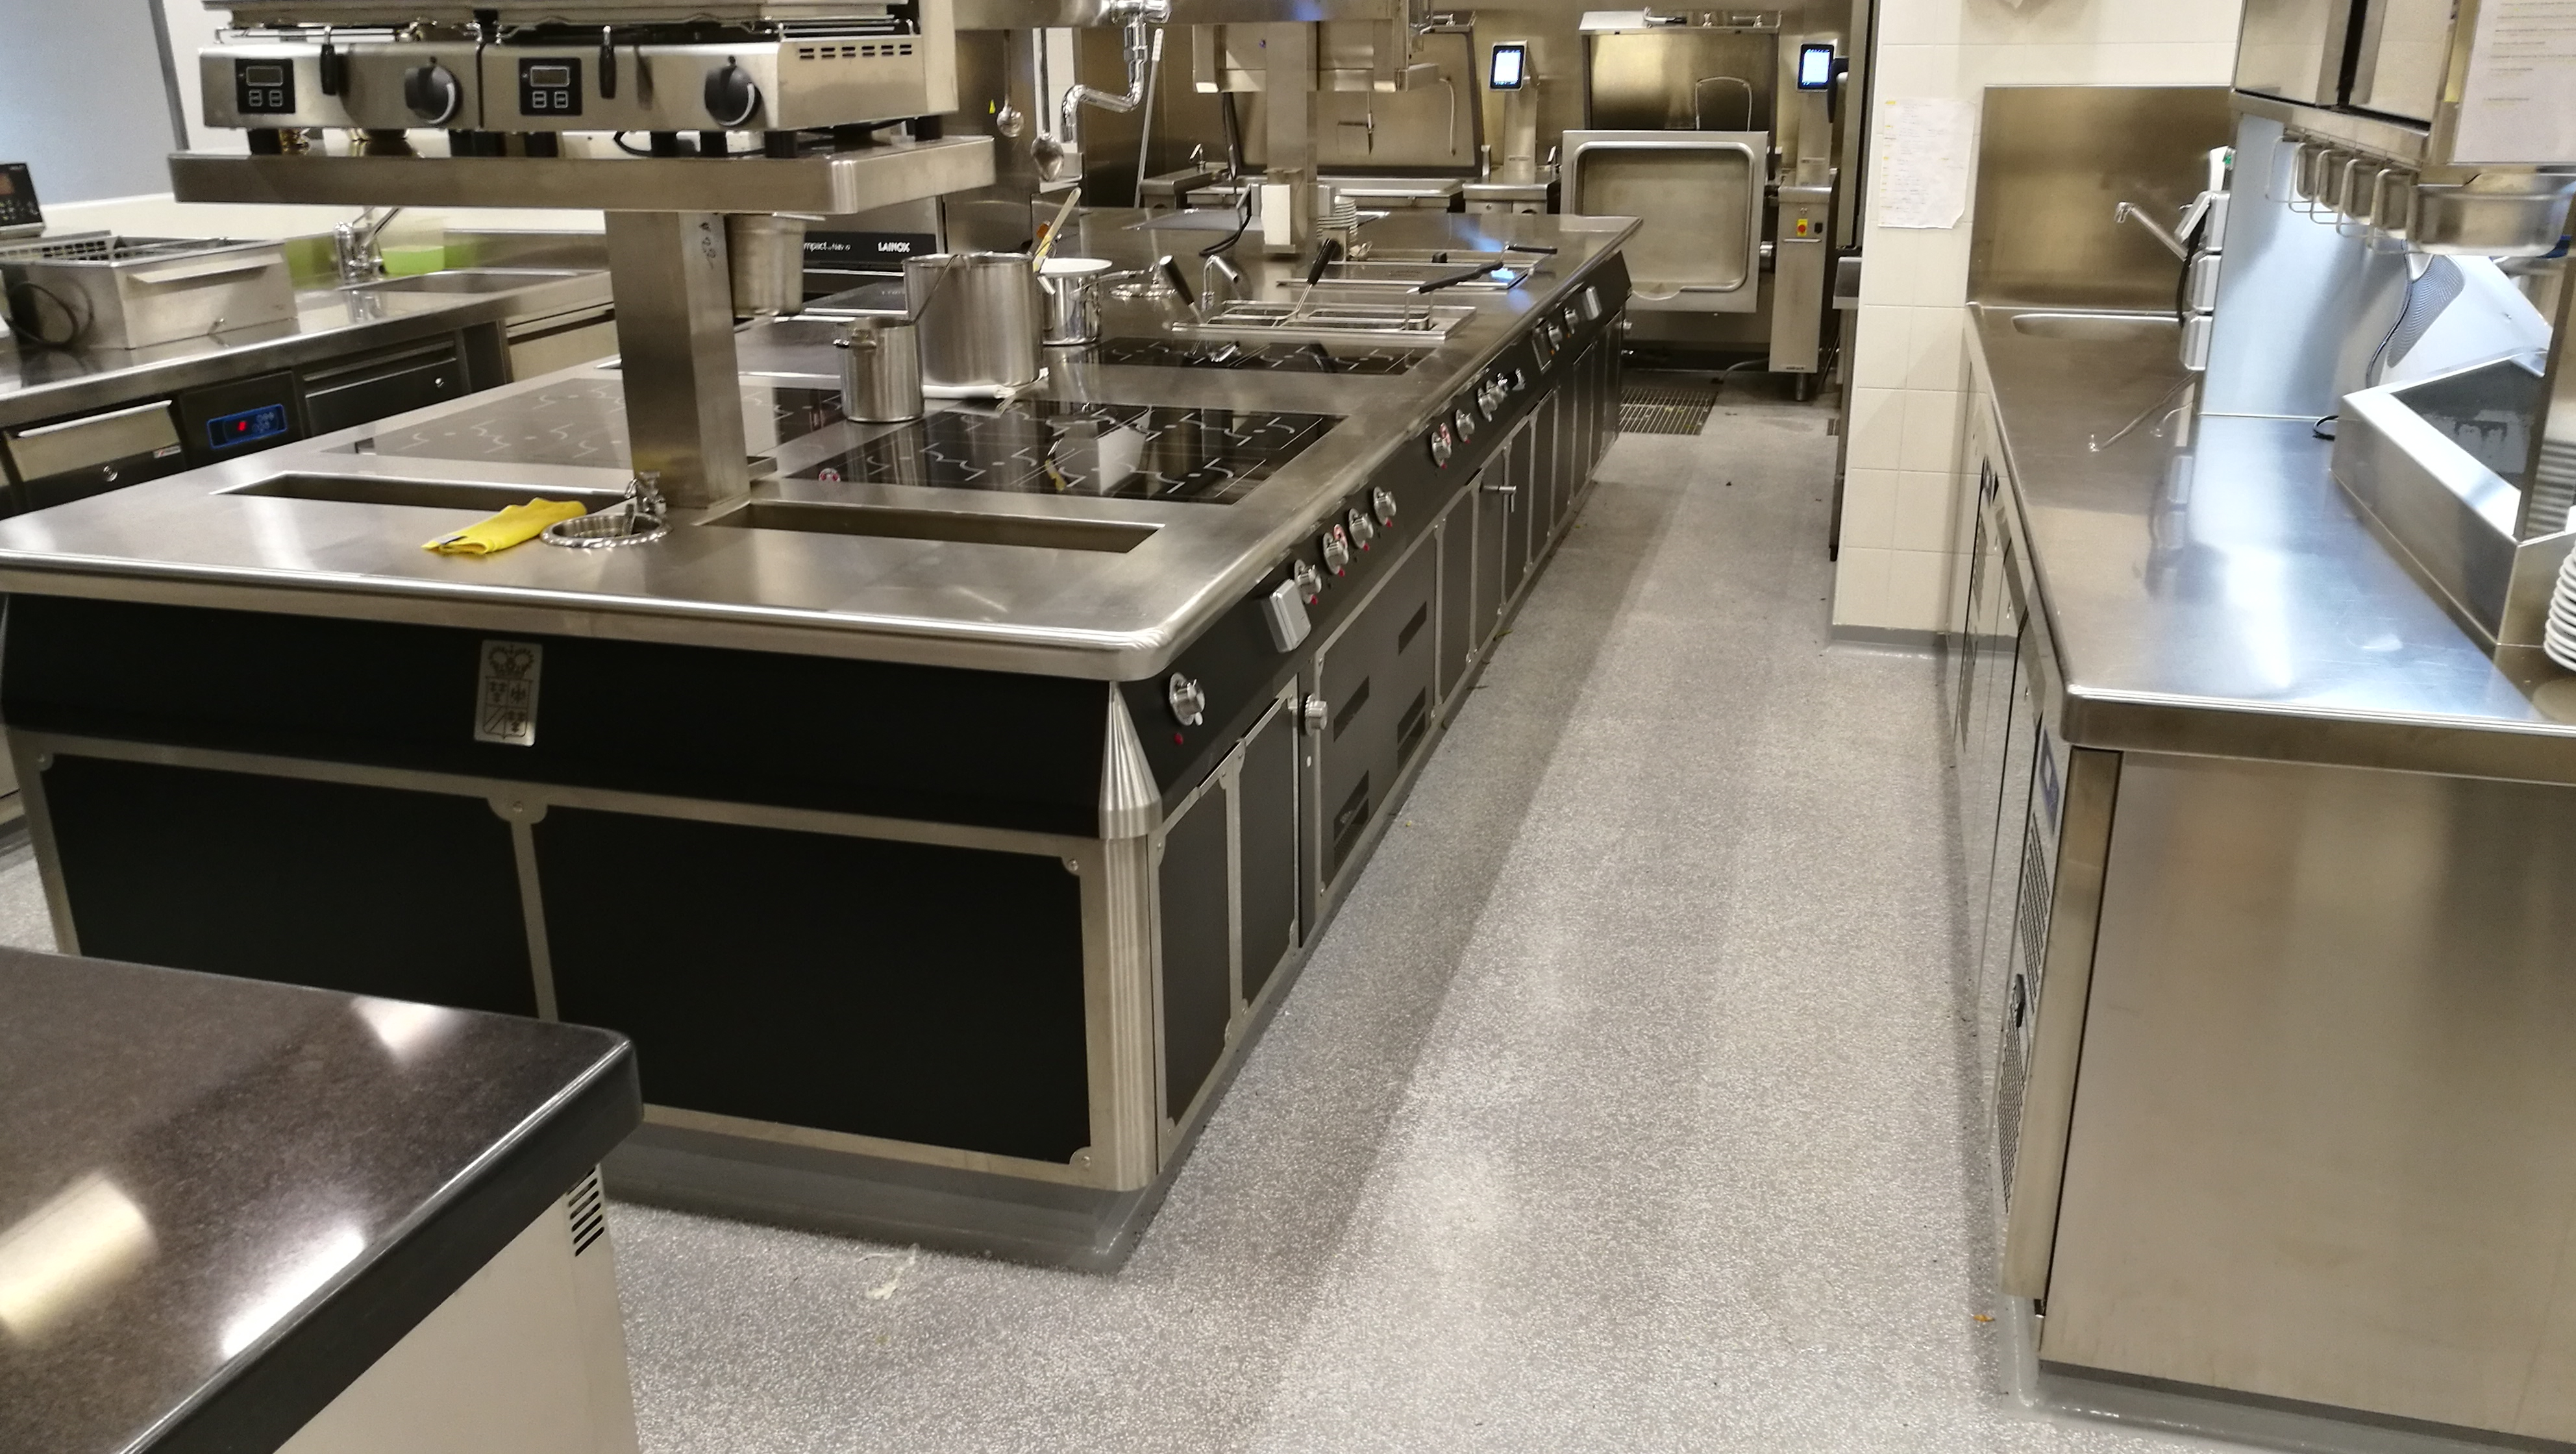 Pavimenti per cucine industriali in resina - Prima Pavimenti